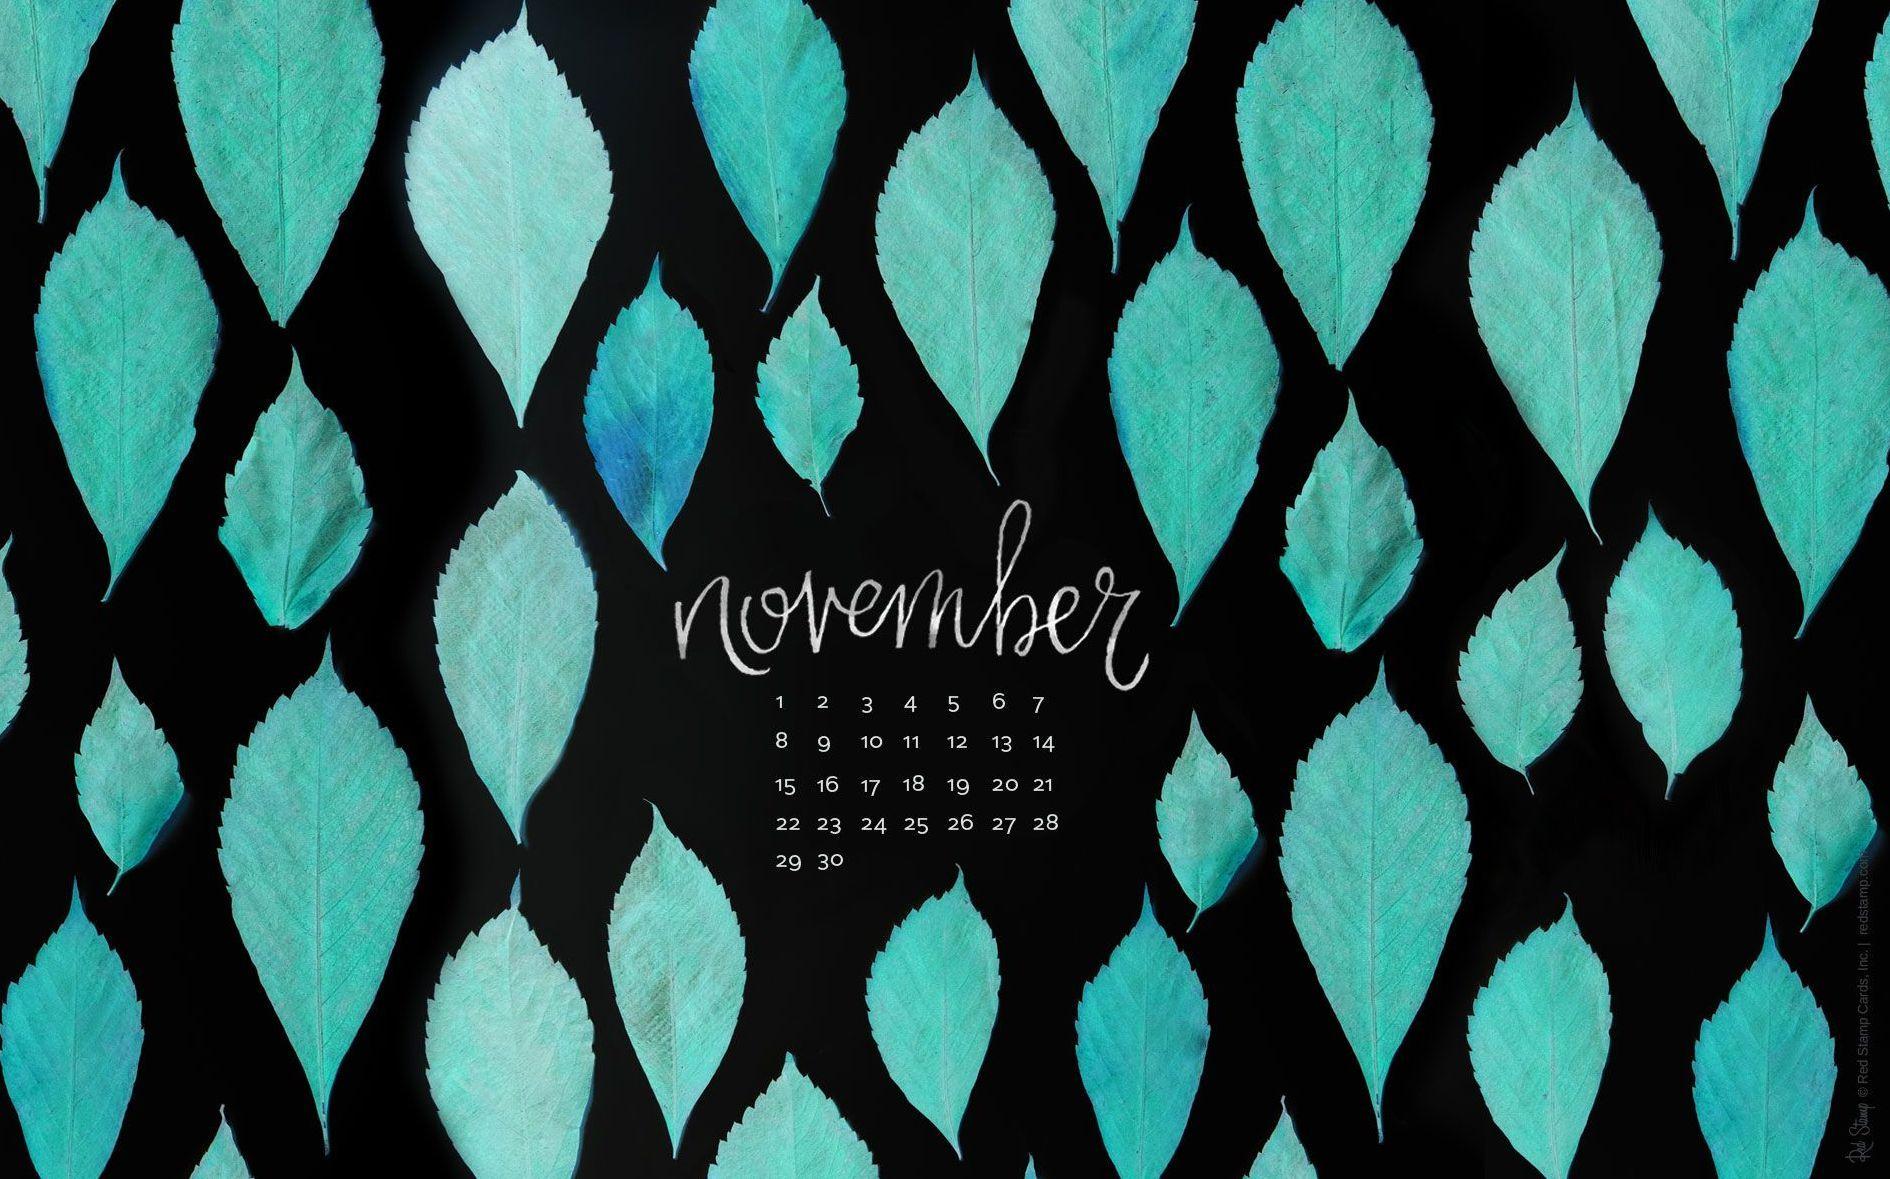 November 2018 Calendar Wallpaper November Wallpaper Calendar Wallpaper Wallpaper Notebook